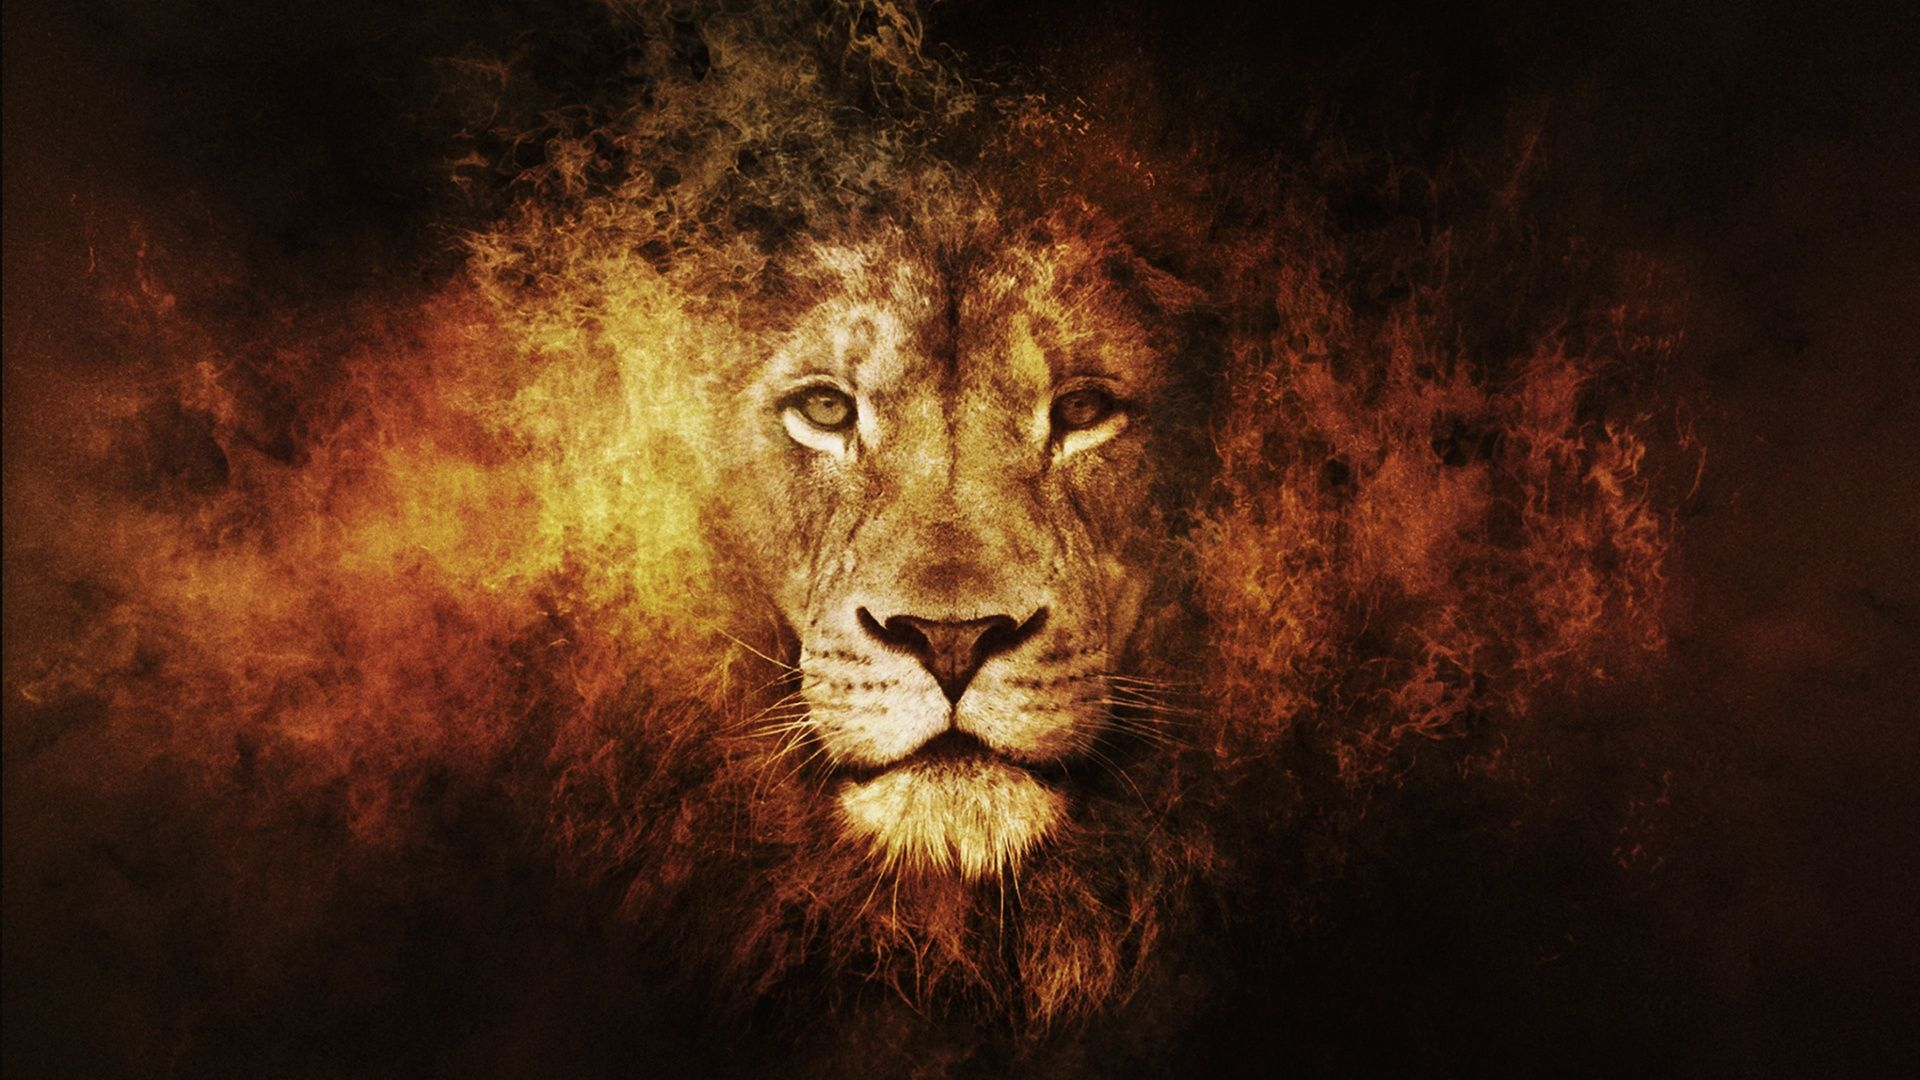 desktop lion hd wallpapers 1080p